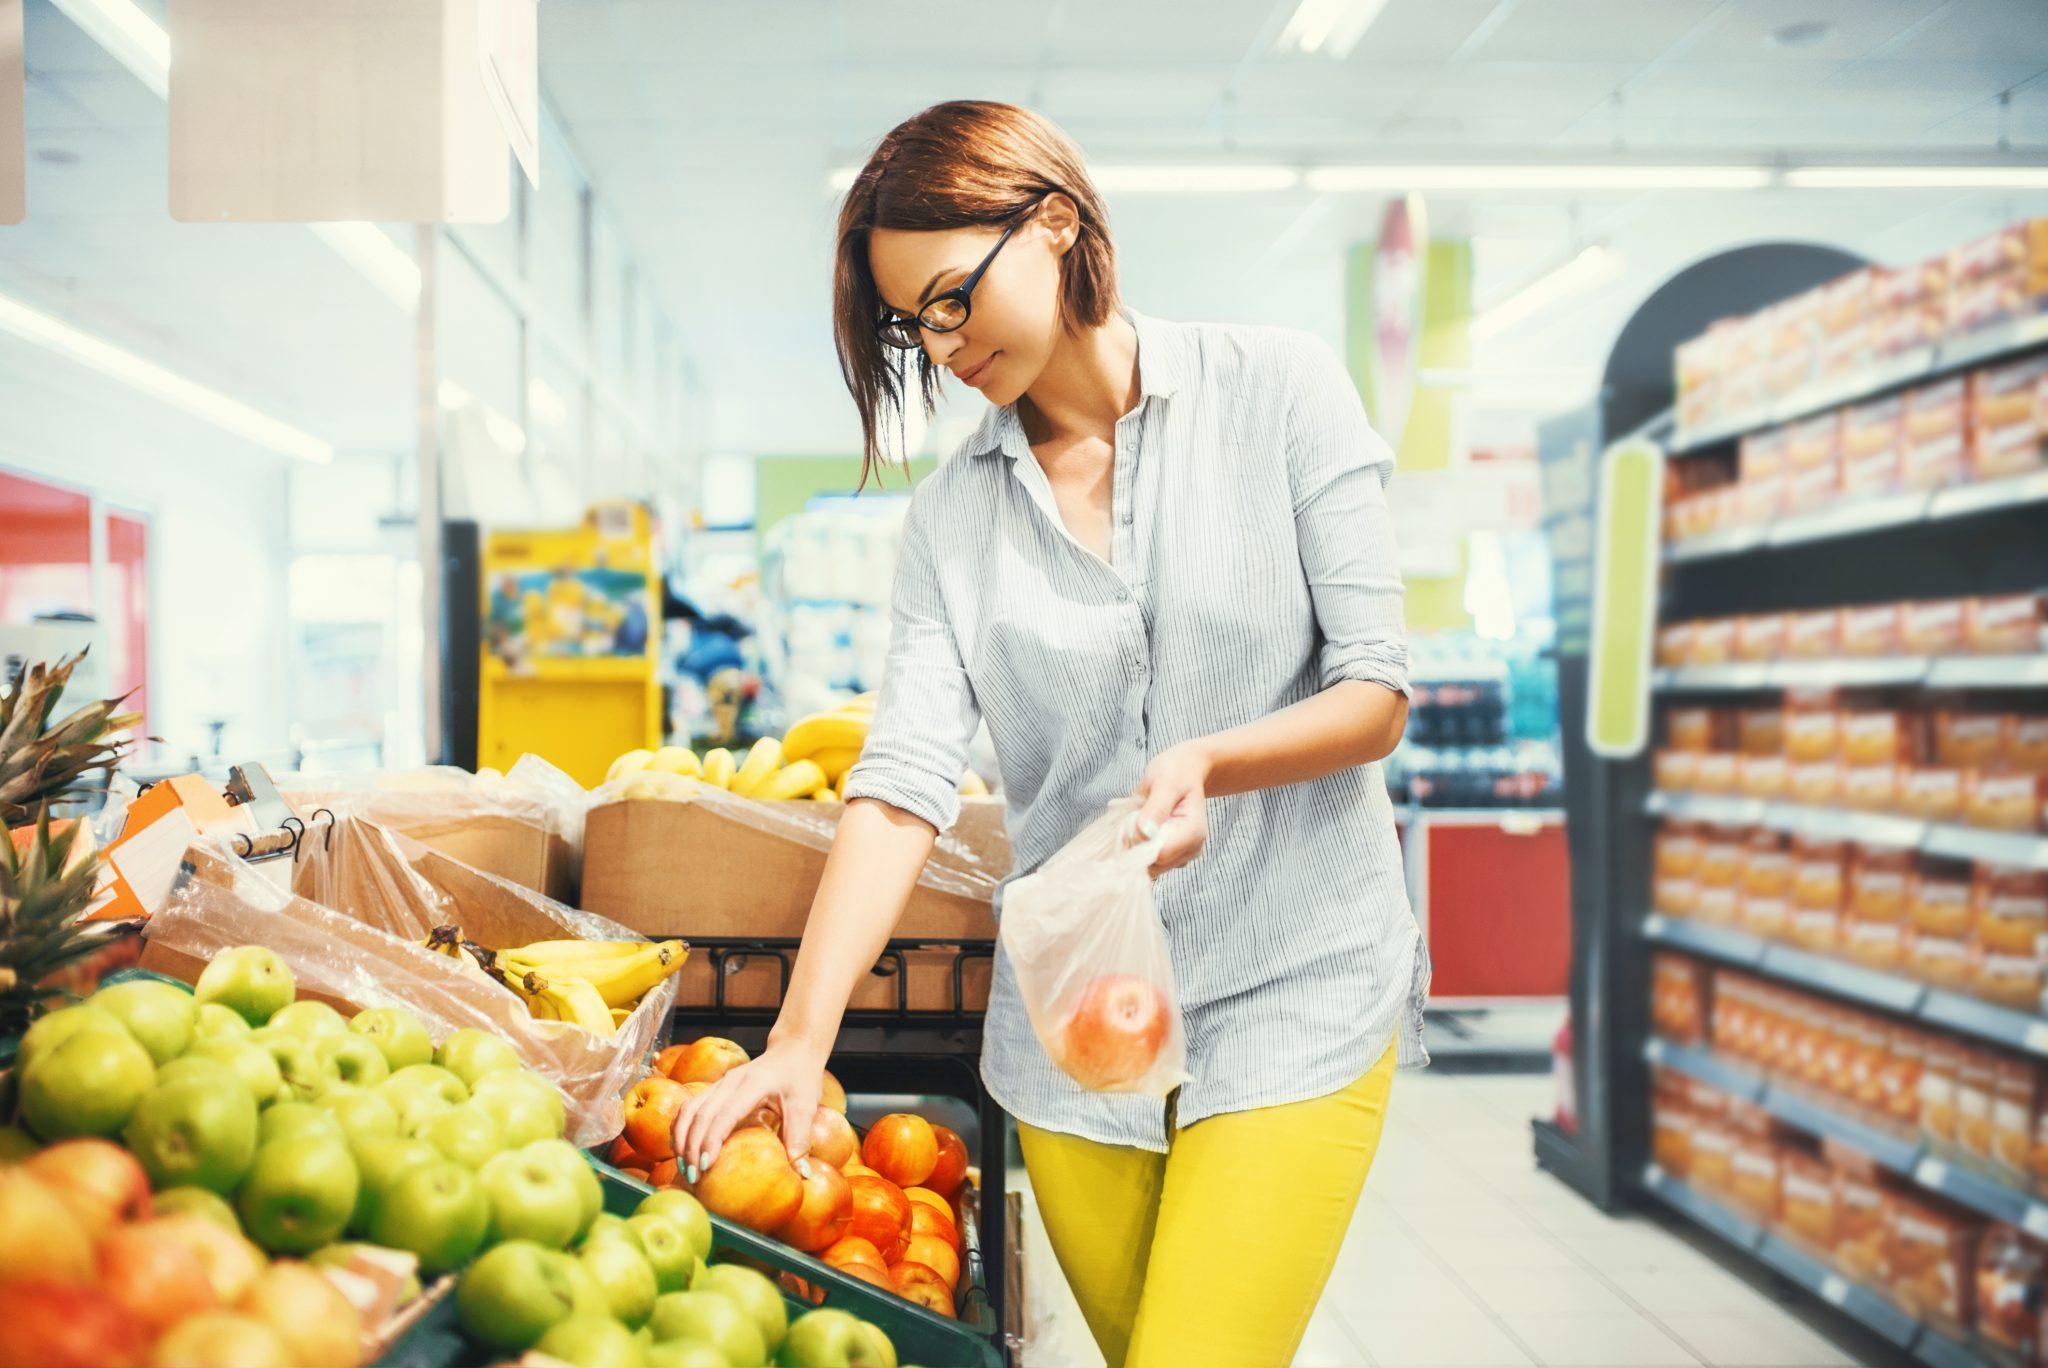 Woman choosing apples to buy in a supermarket.